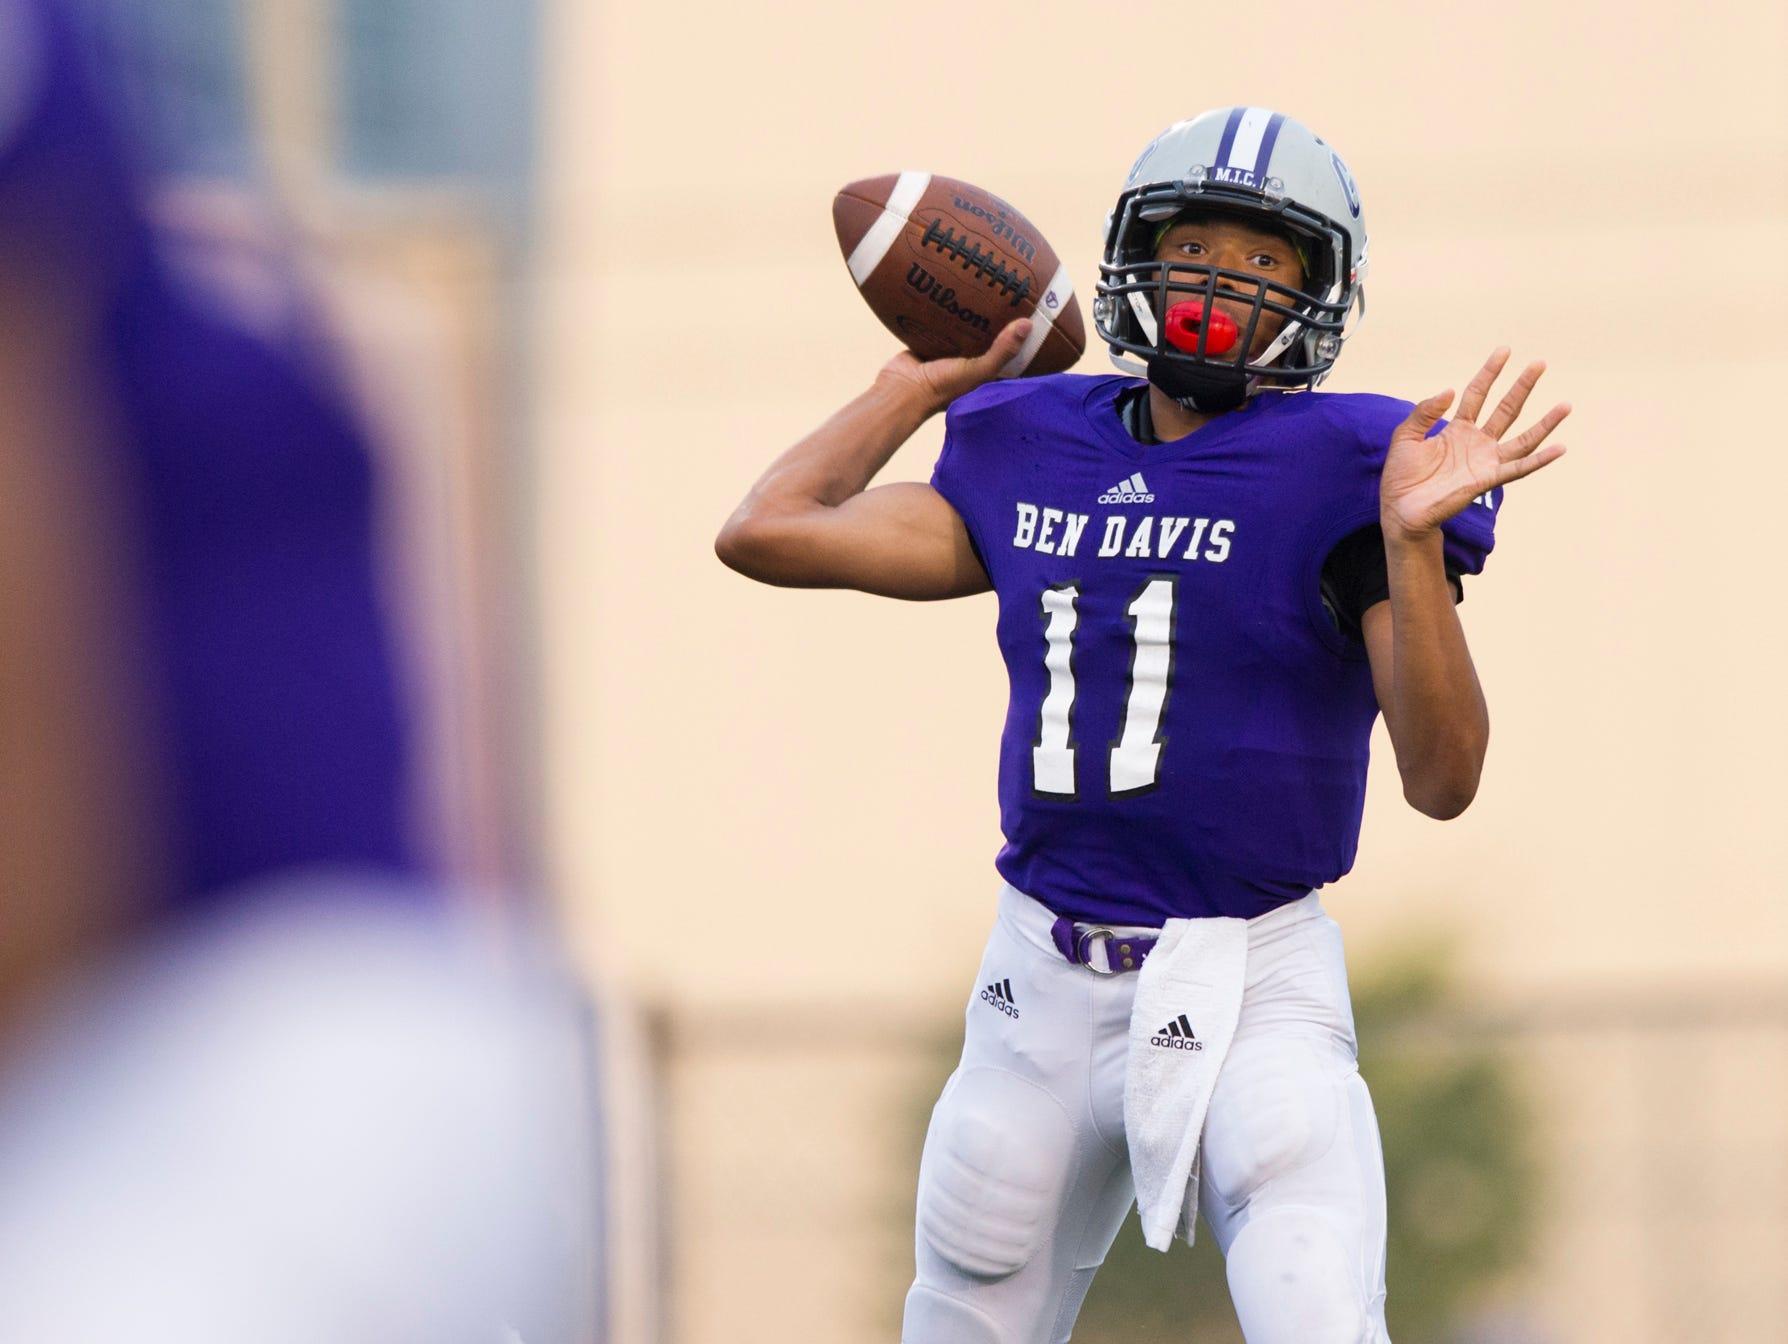 Ben Davis High School sophomore Reese Taylor (11) draws back to make a pass during first-half action of a IHSAA varsity football game at Ben Davis High School, Friday, September 18, 2015.